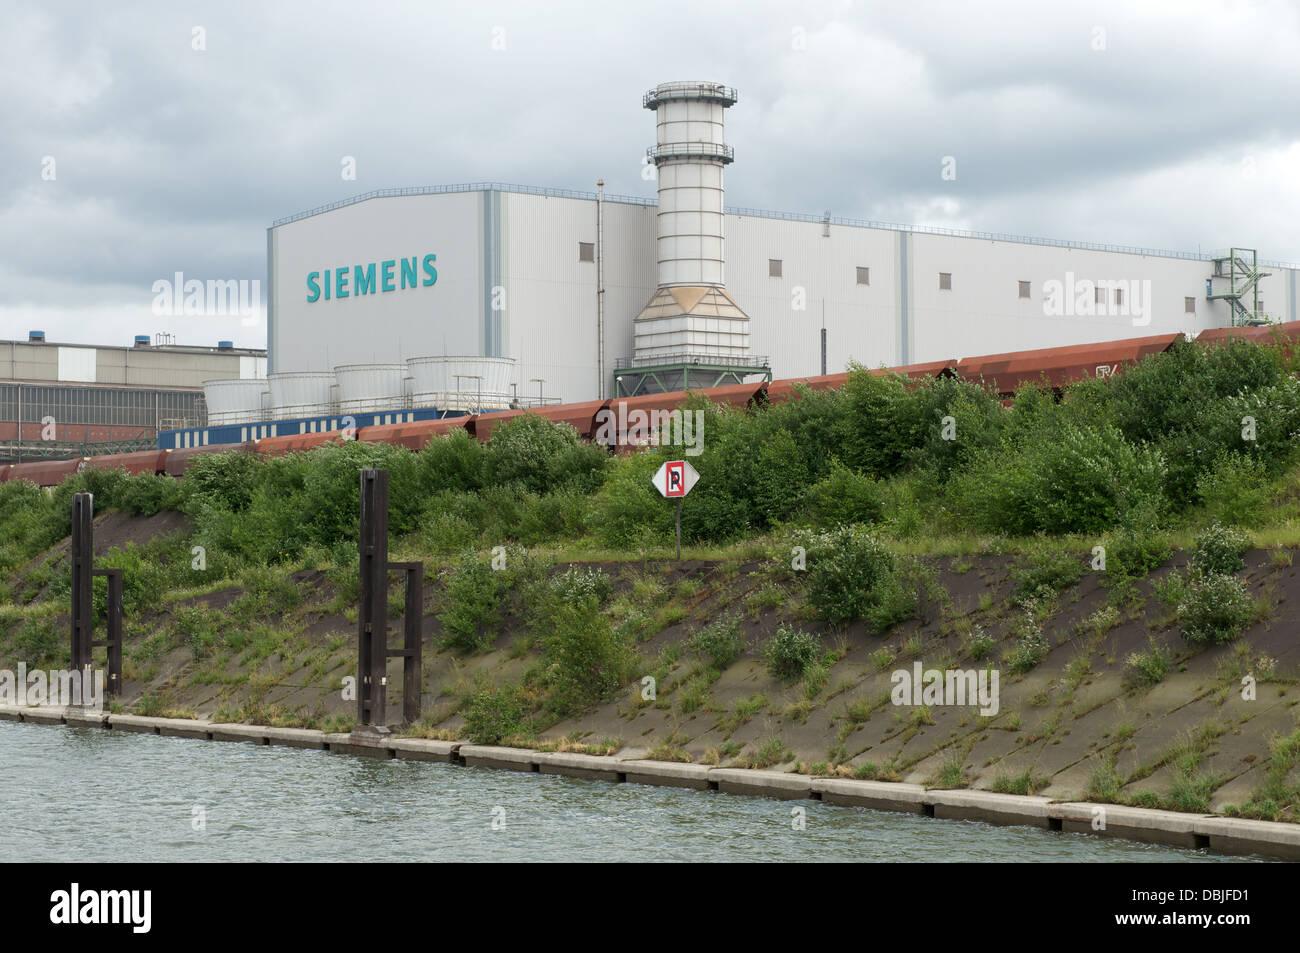 Siemens factory Duisburg Germany - Stock Image